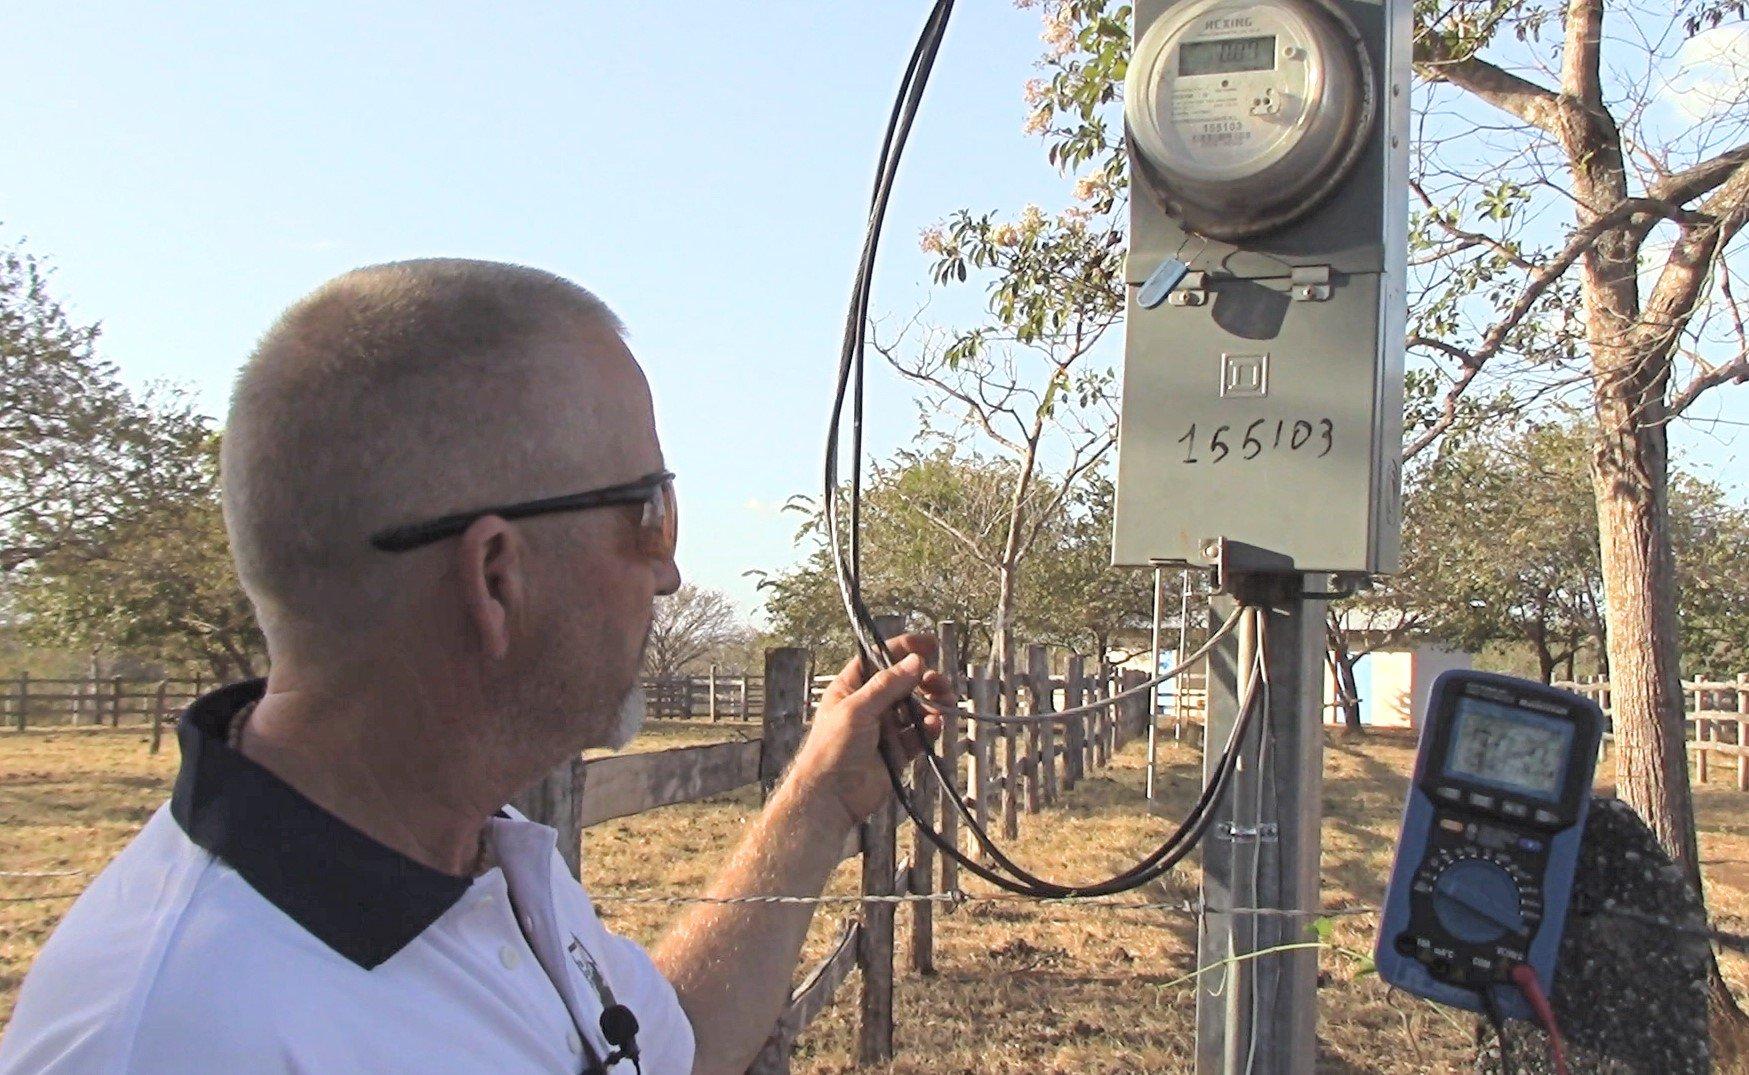 Costa Rica Power Meter